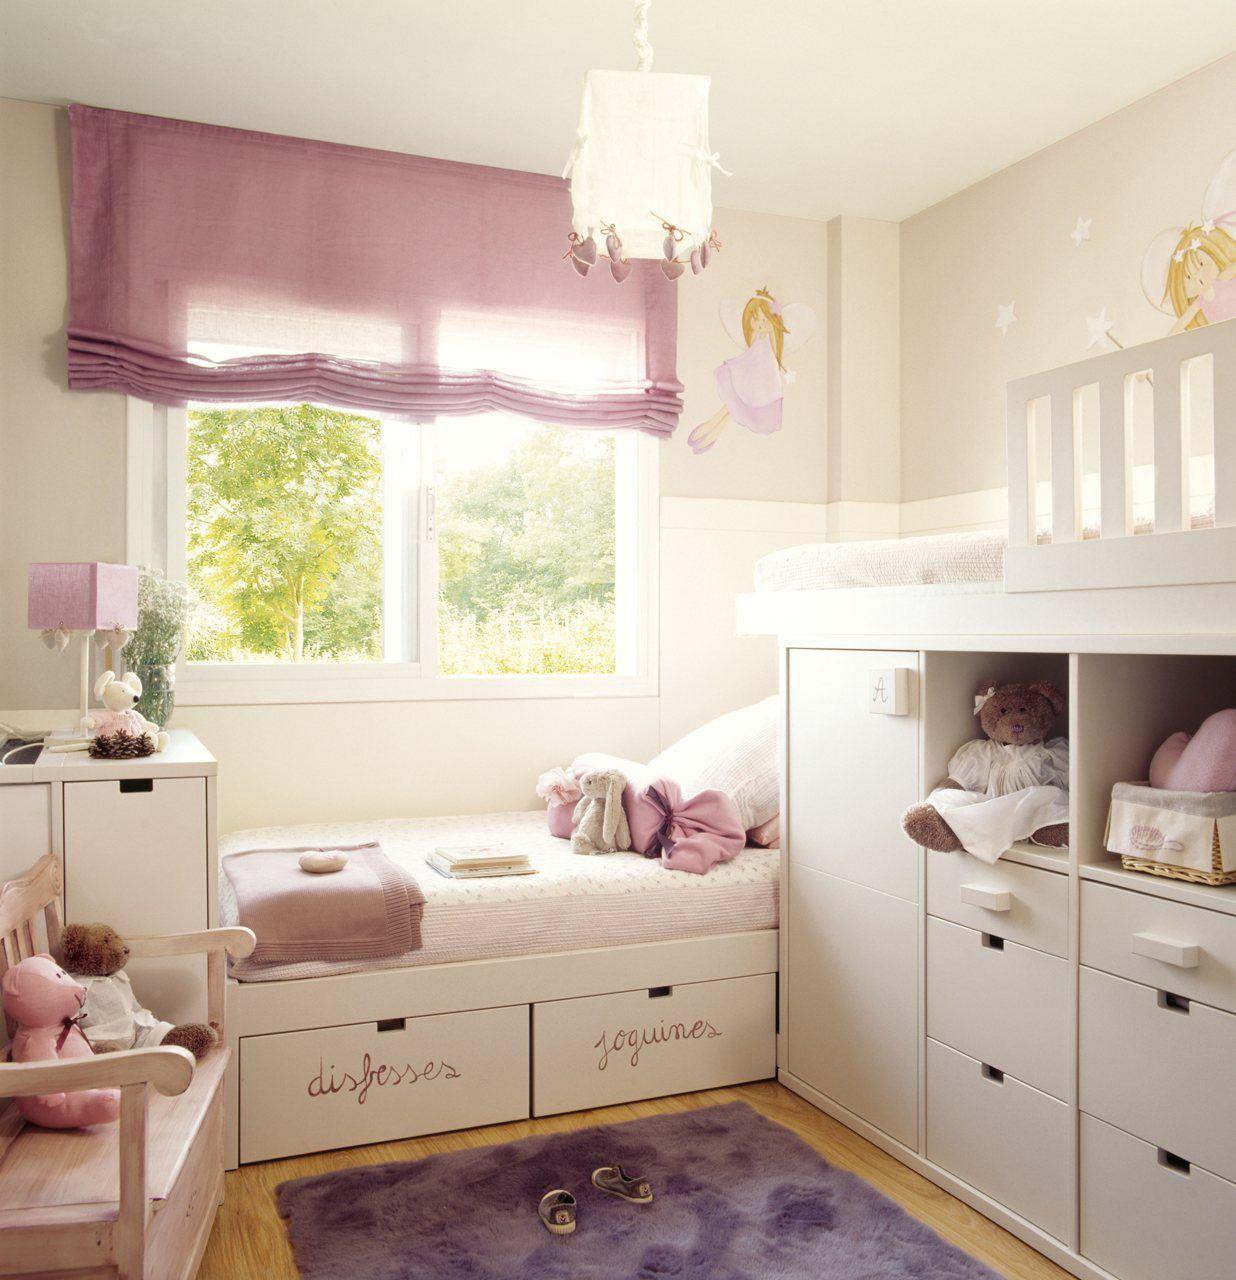 Dormitorios infantiles peque os s cales partido - Dormitorio infantil nina ...